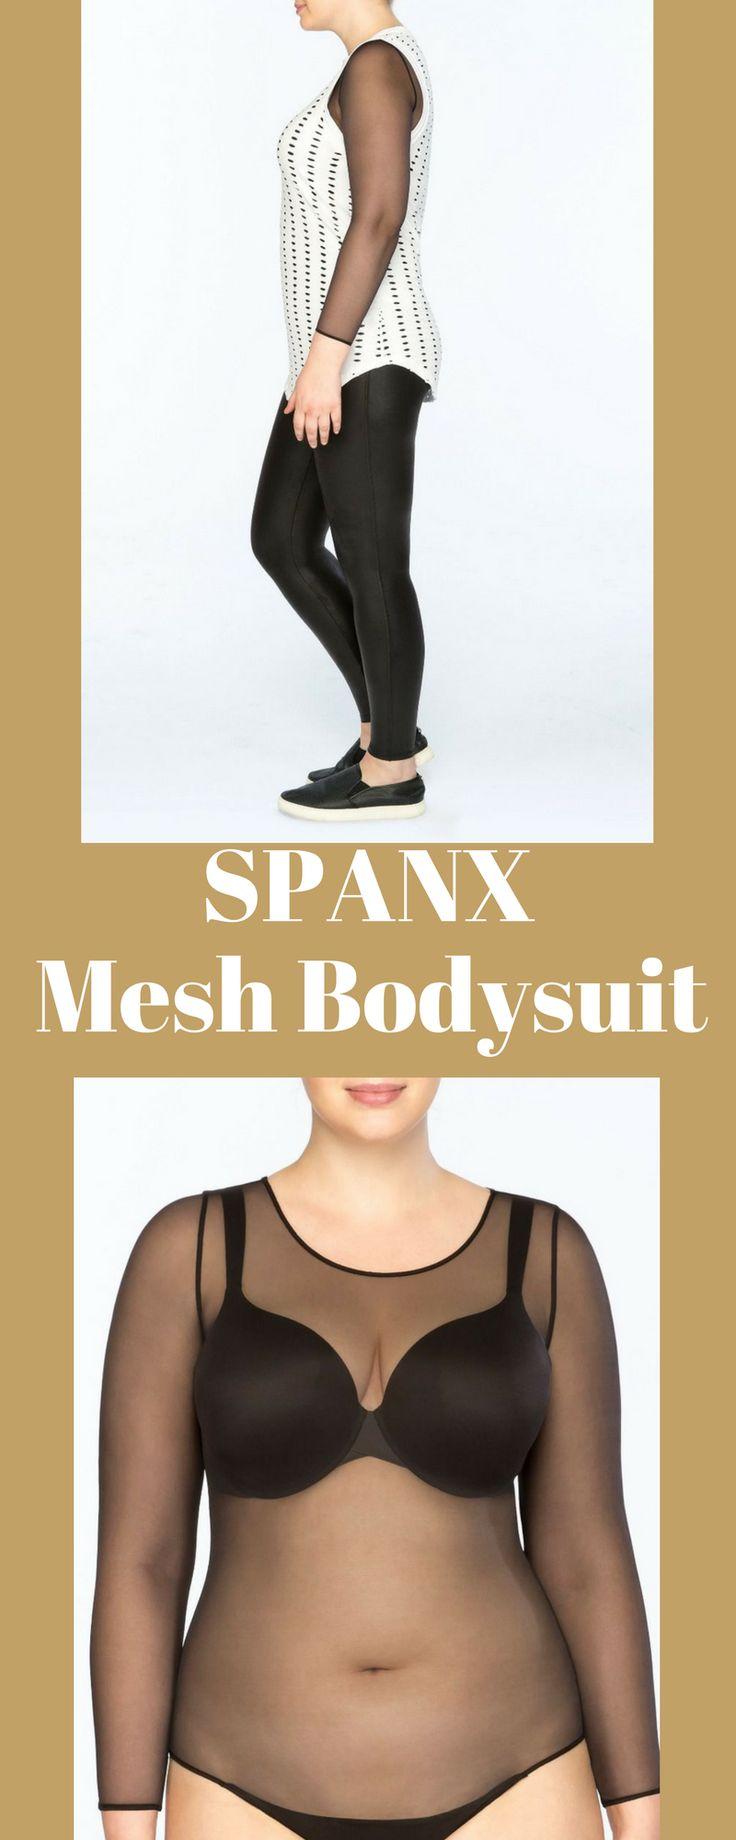 SPANX bodysuit makes me happy when i wear it! #afflink